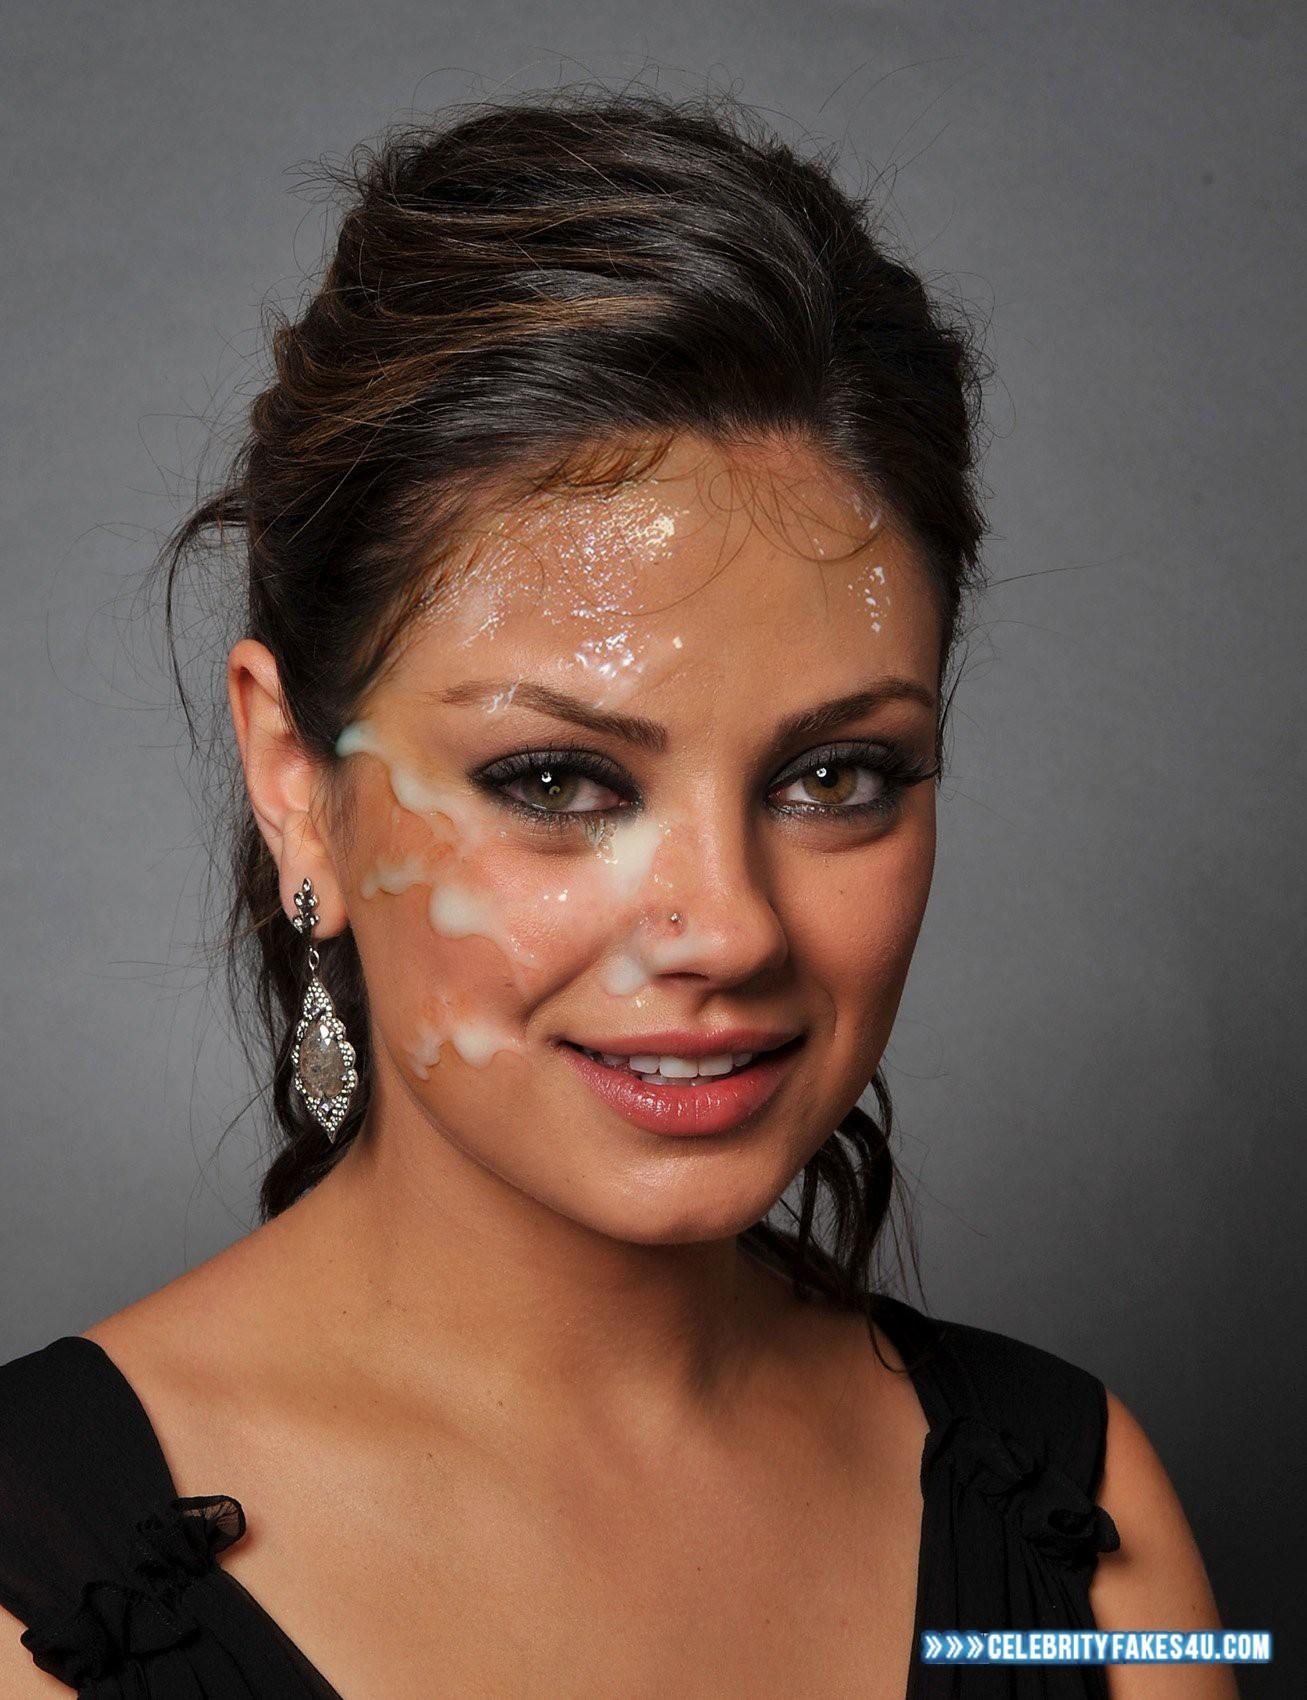 Mila Kunis Facial Cumshot Porn 001 « Celebrity Fakes 4u